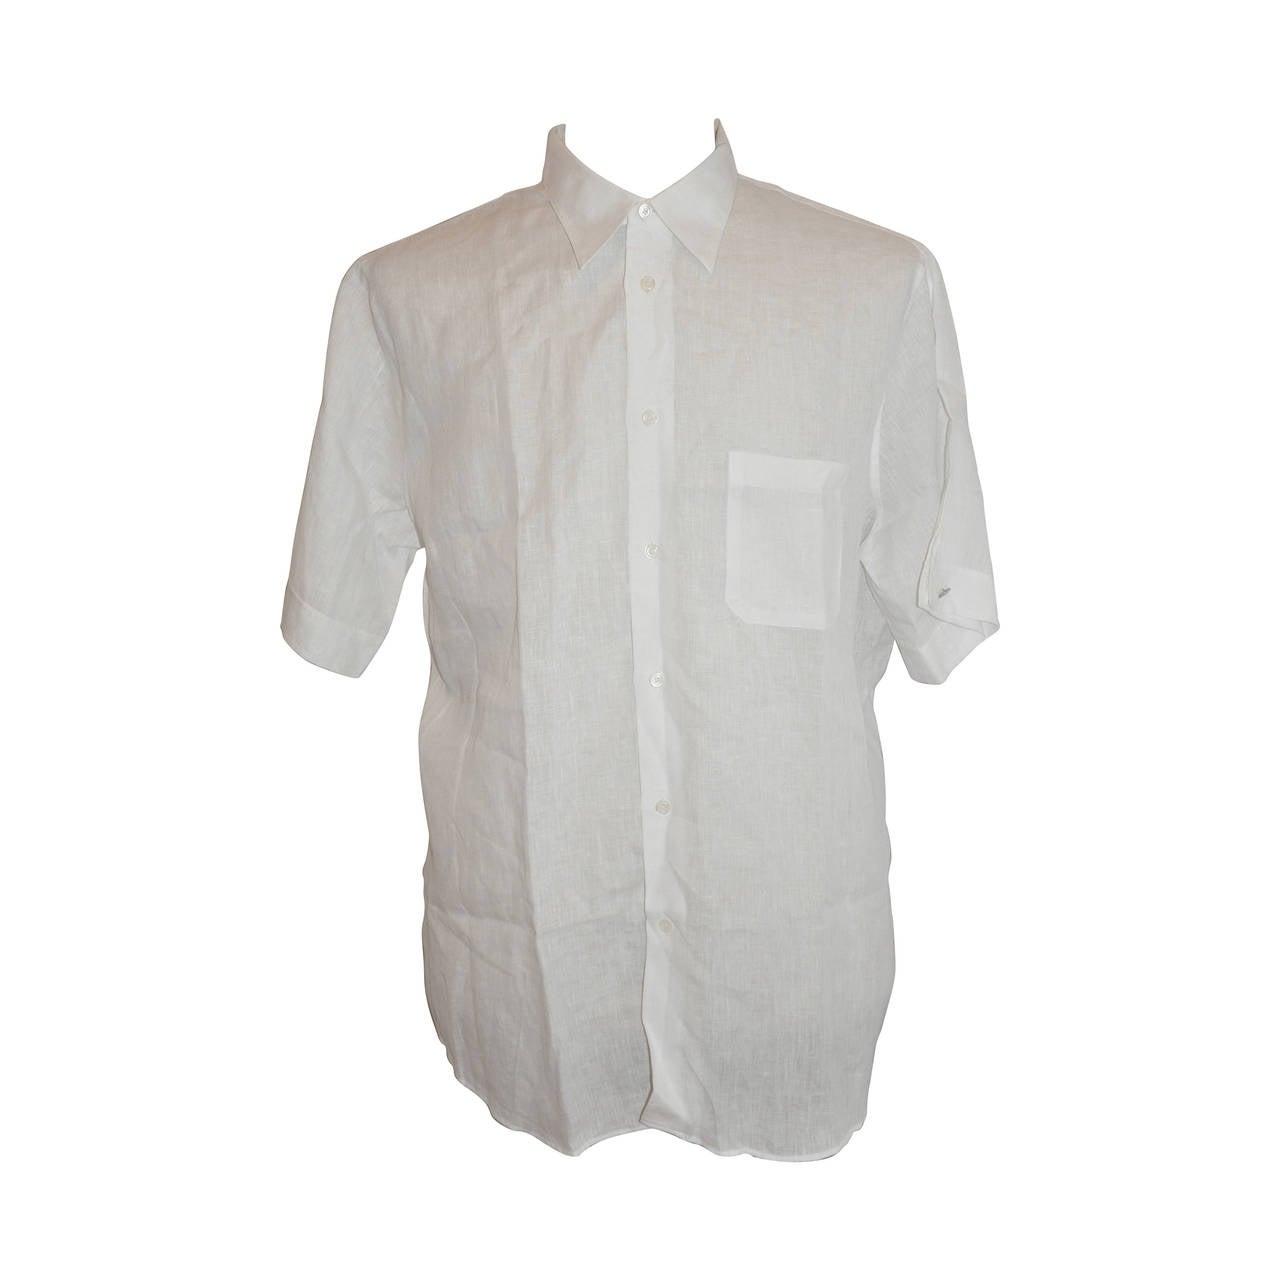 Hermes Men's White Linen Button Shirt with Detailed Cuffs